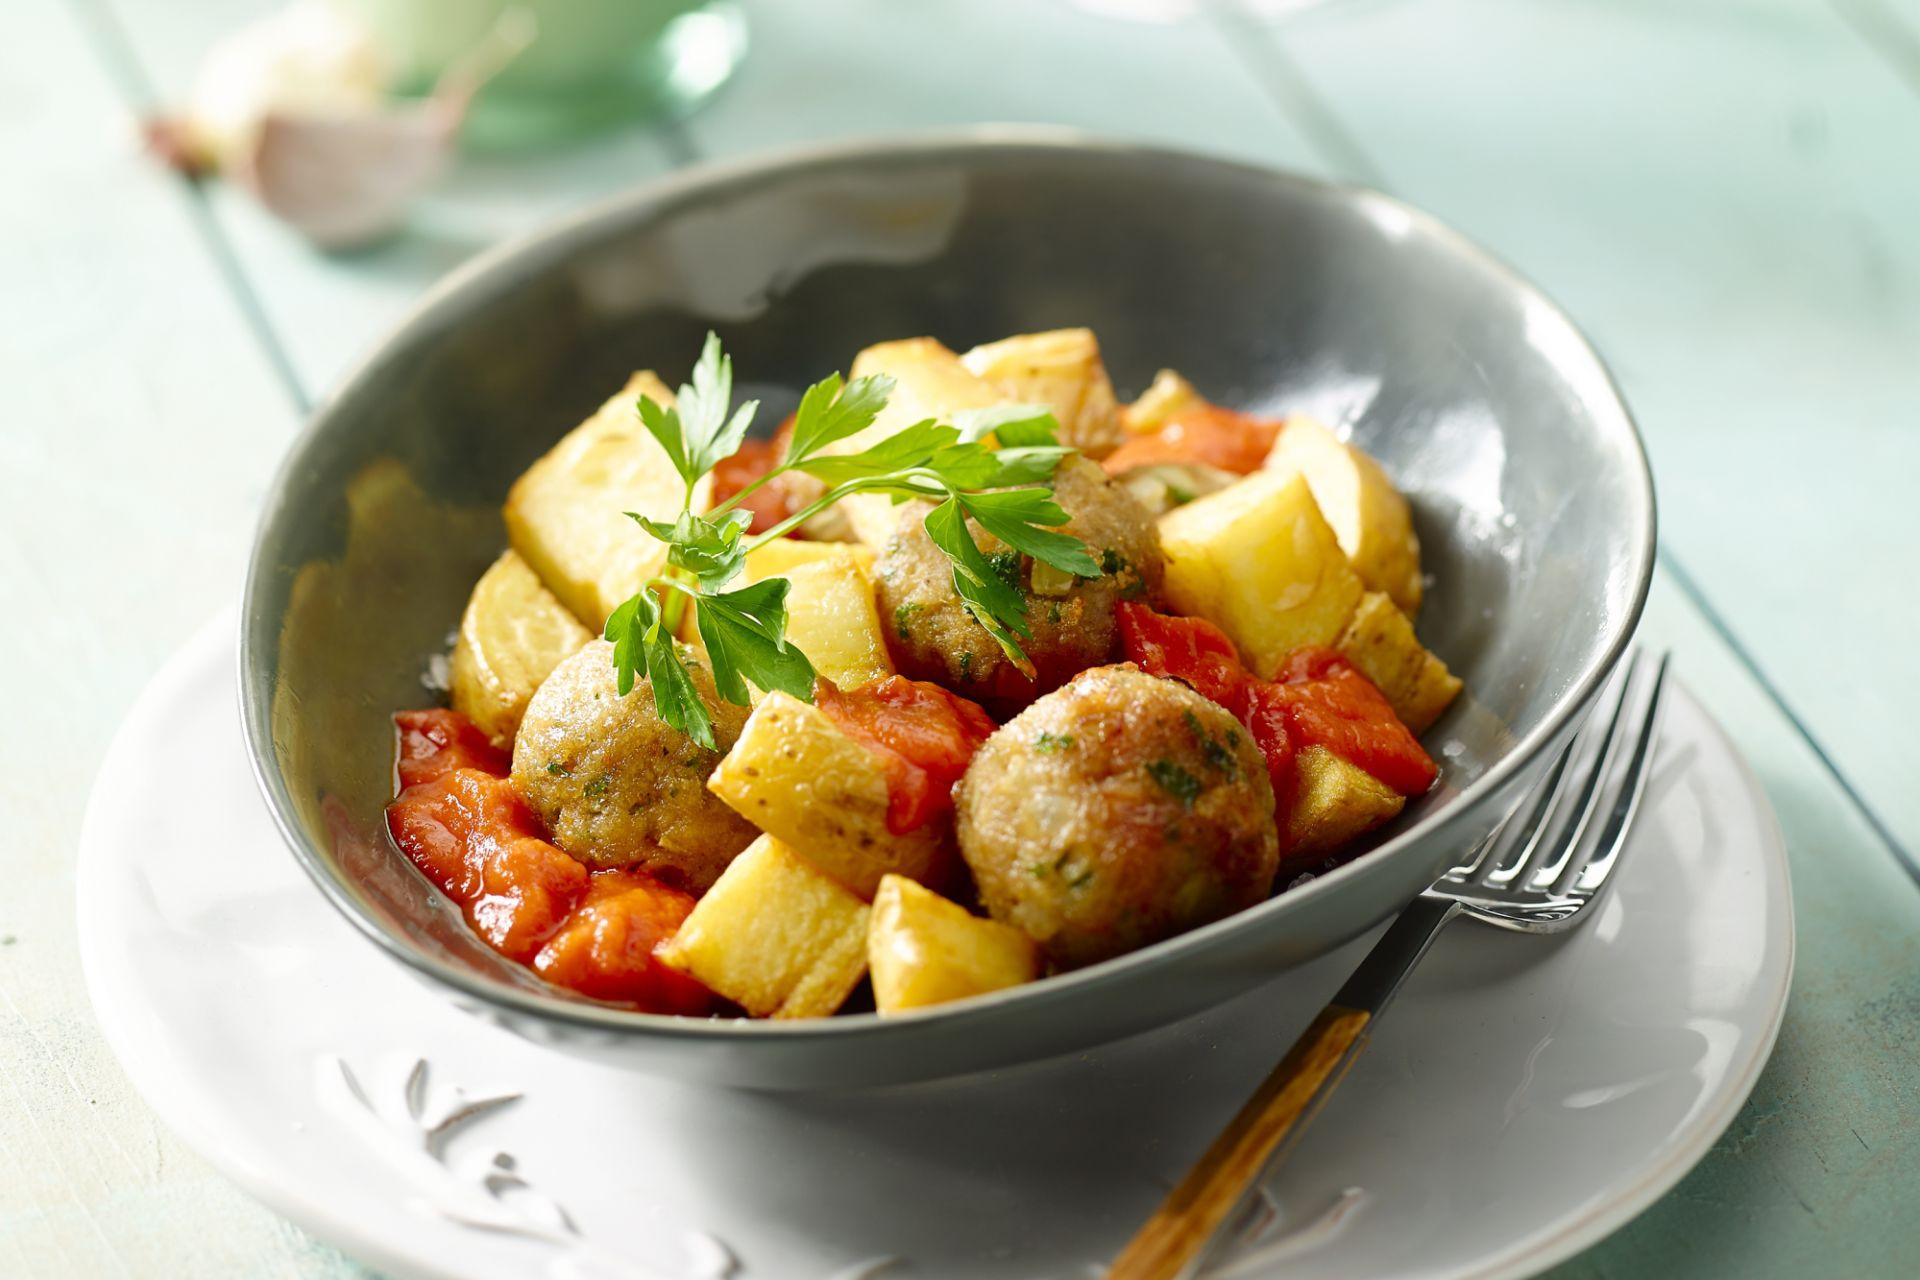 Patatas bravas met balletjes in tomatensaus